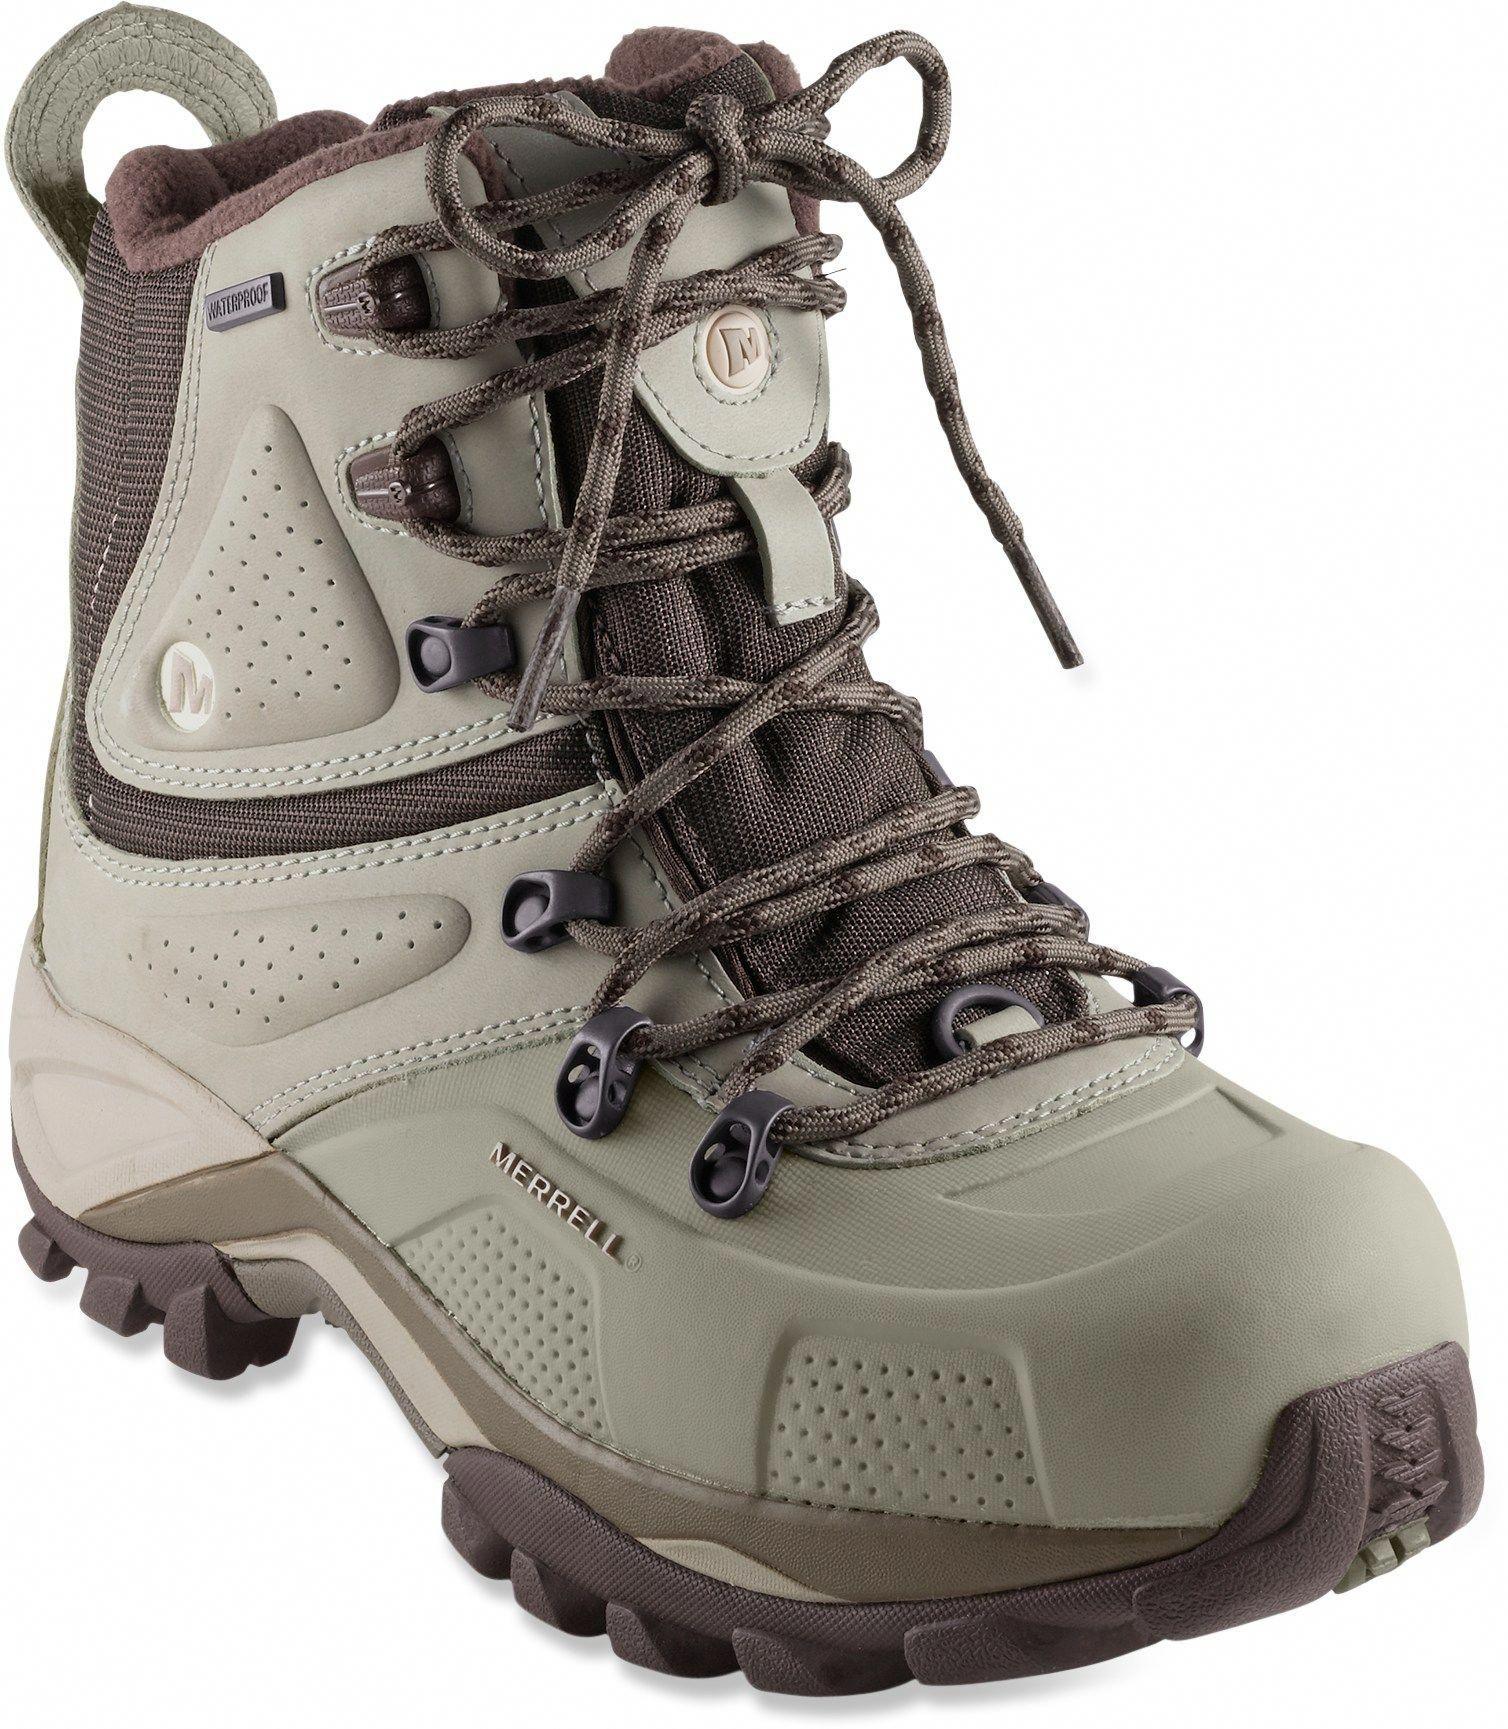 Mens winter boots, Waterproof winter boots